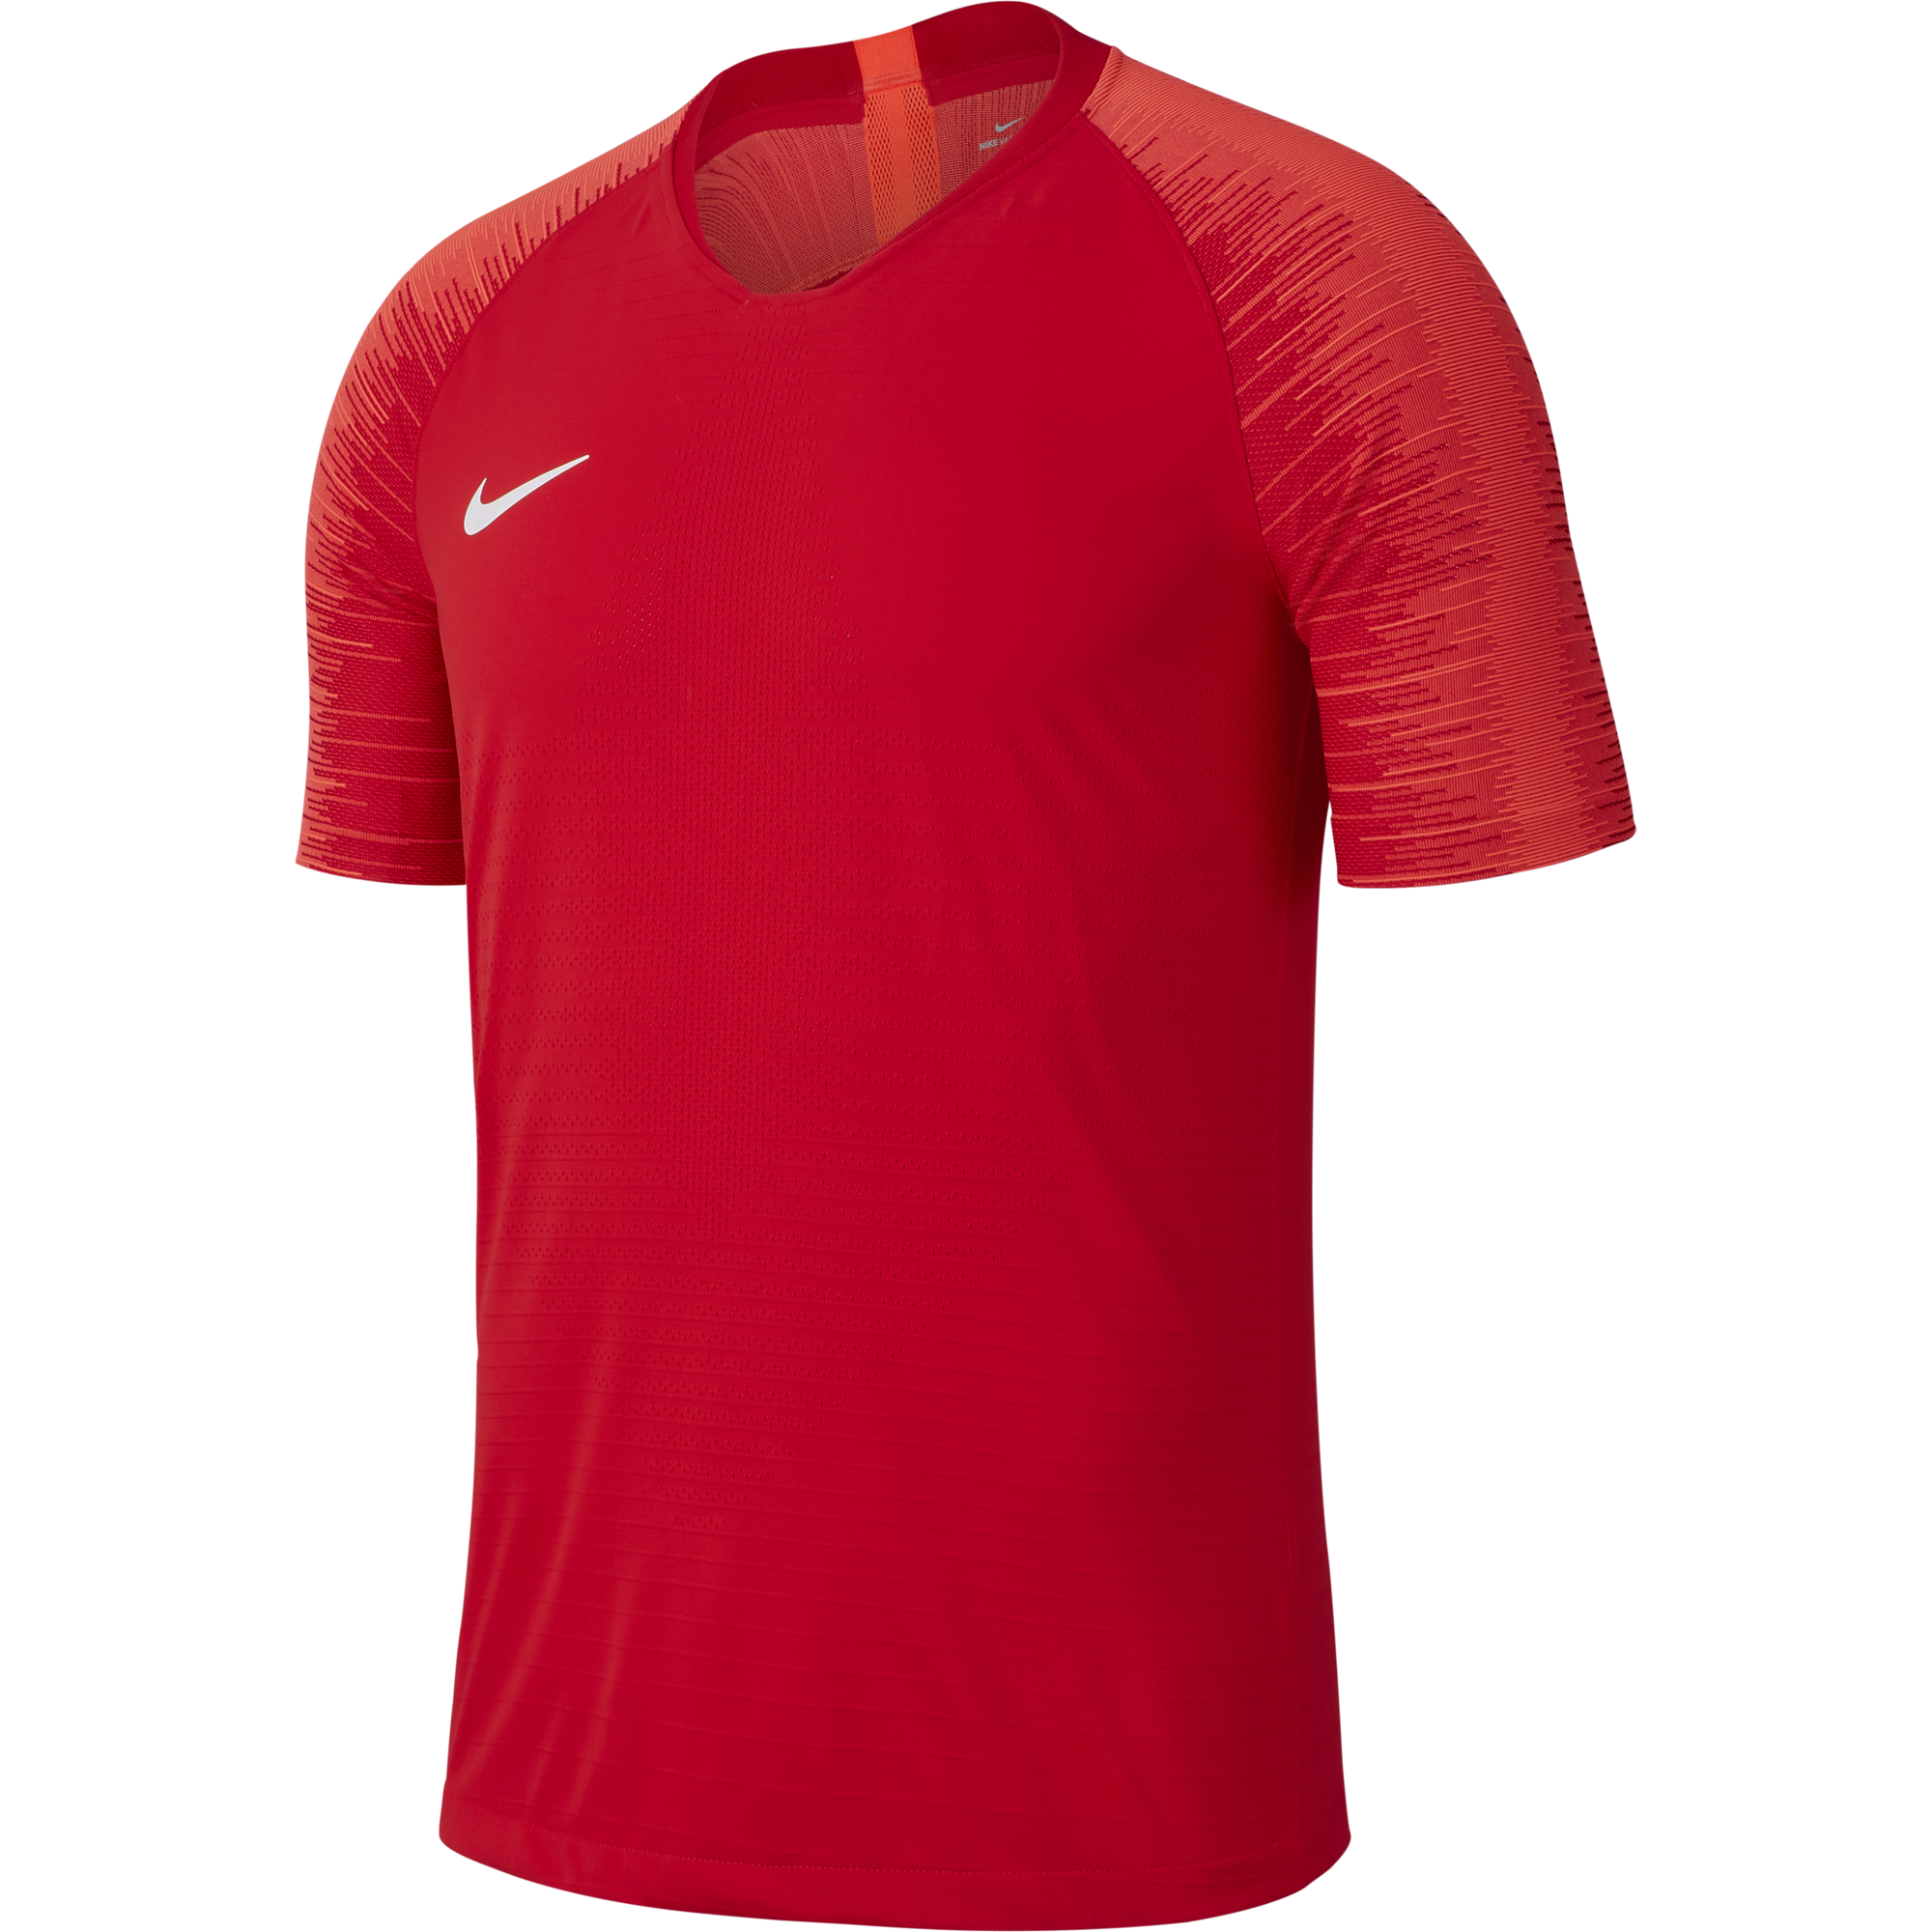 nike vapor knit jersey uni red bright crimson size xl mans 24110 p